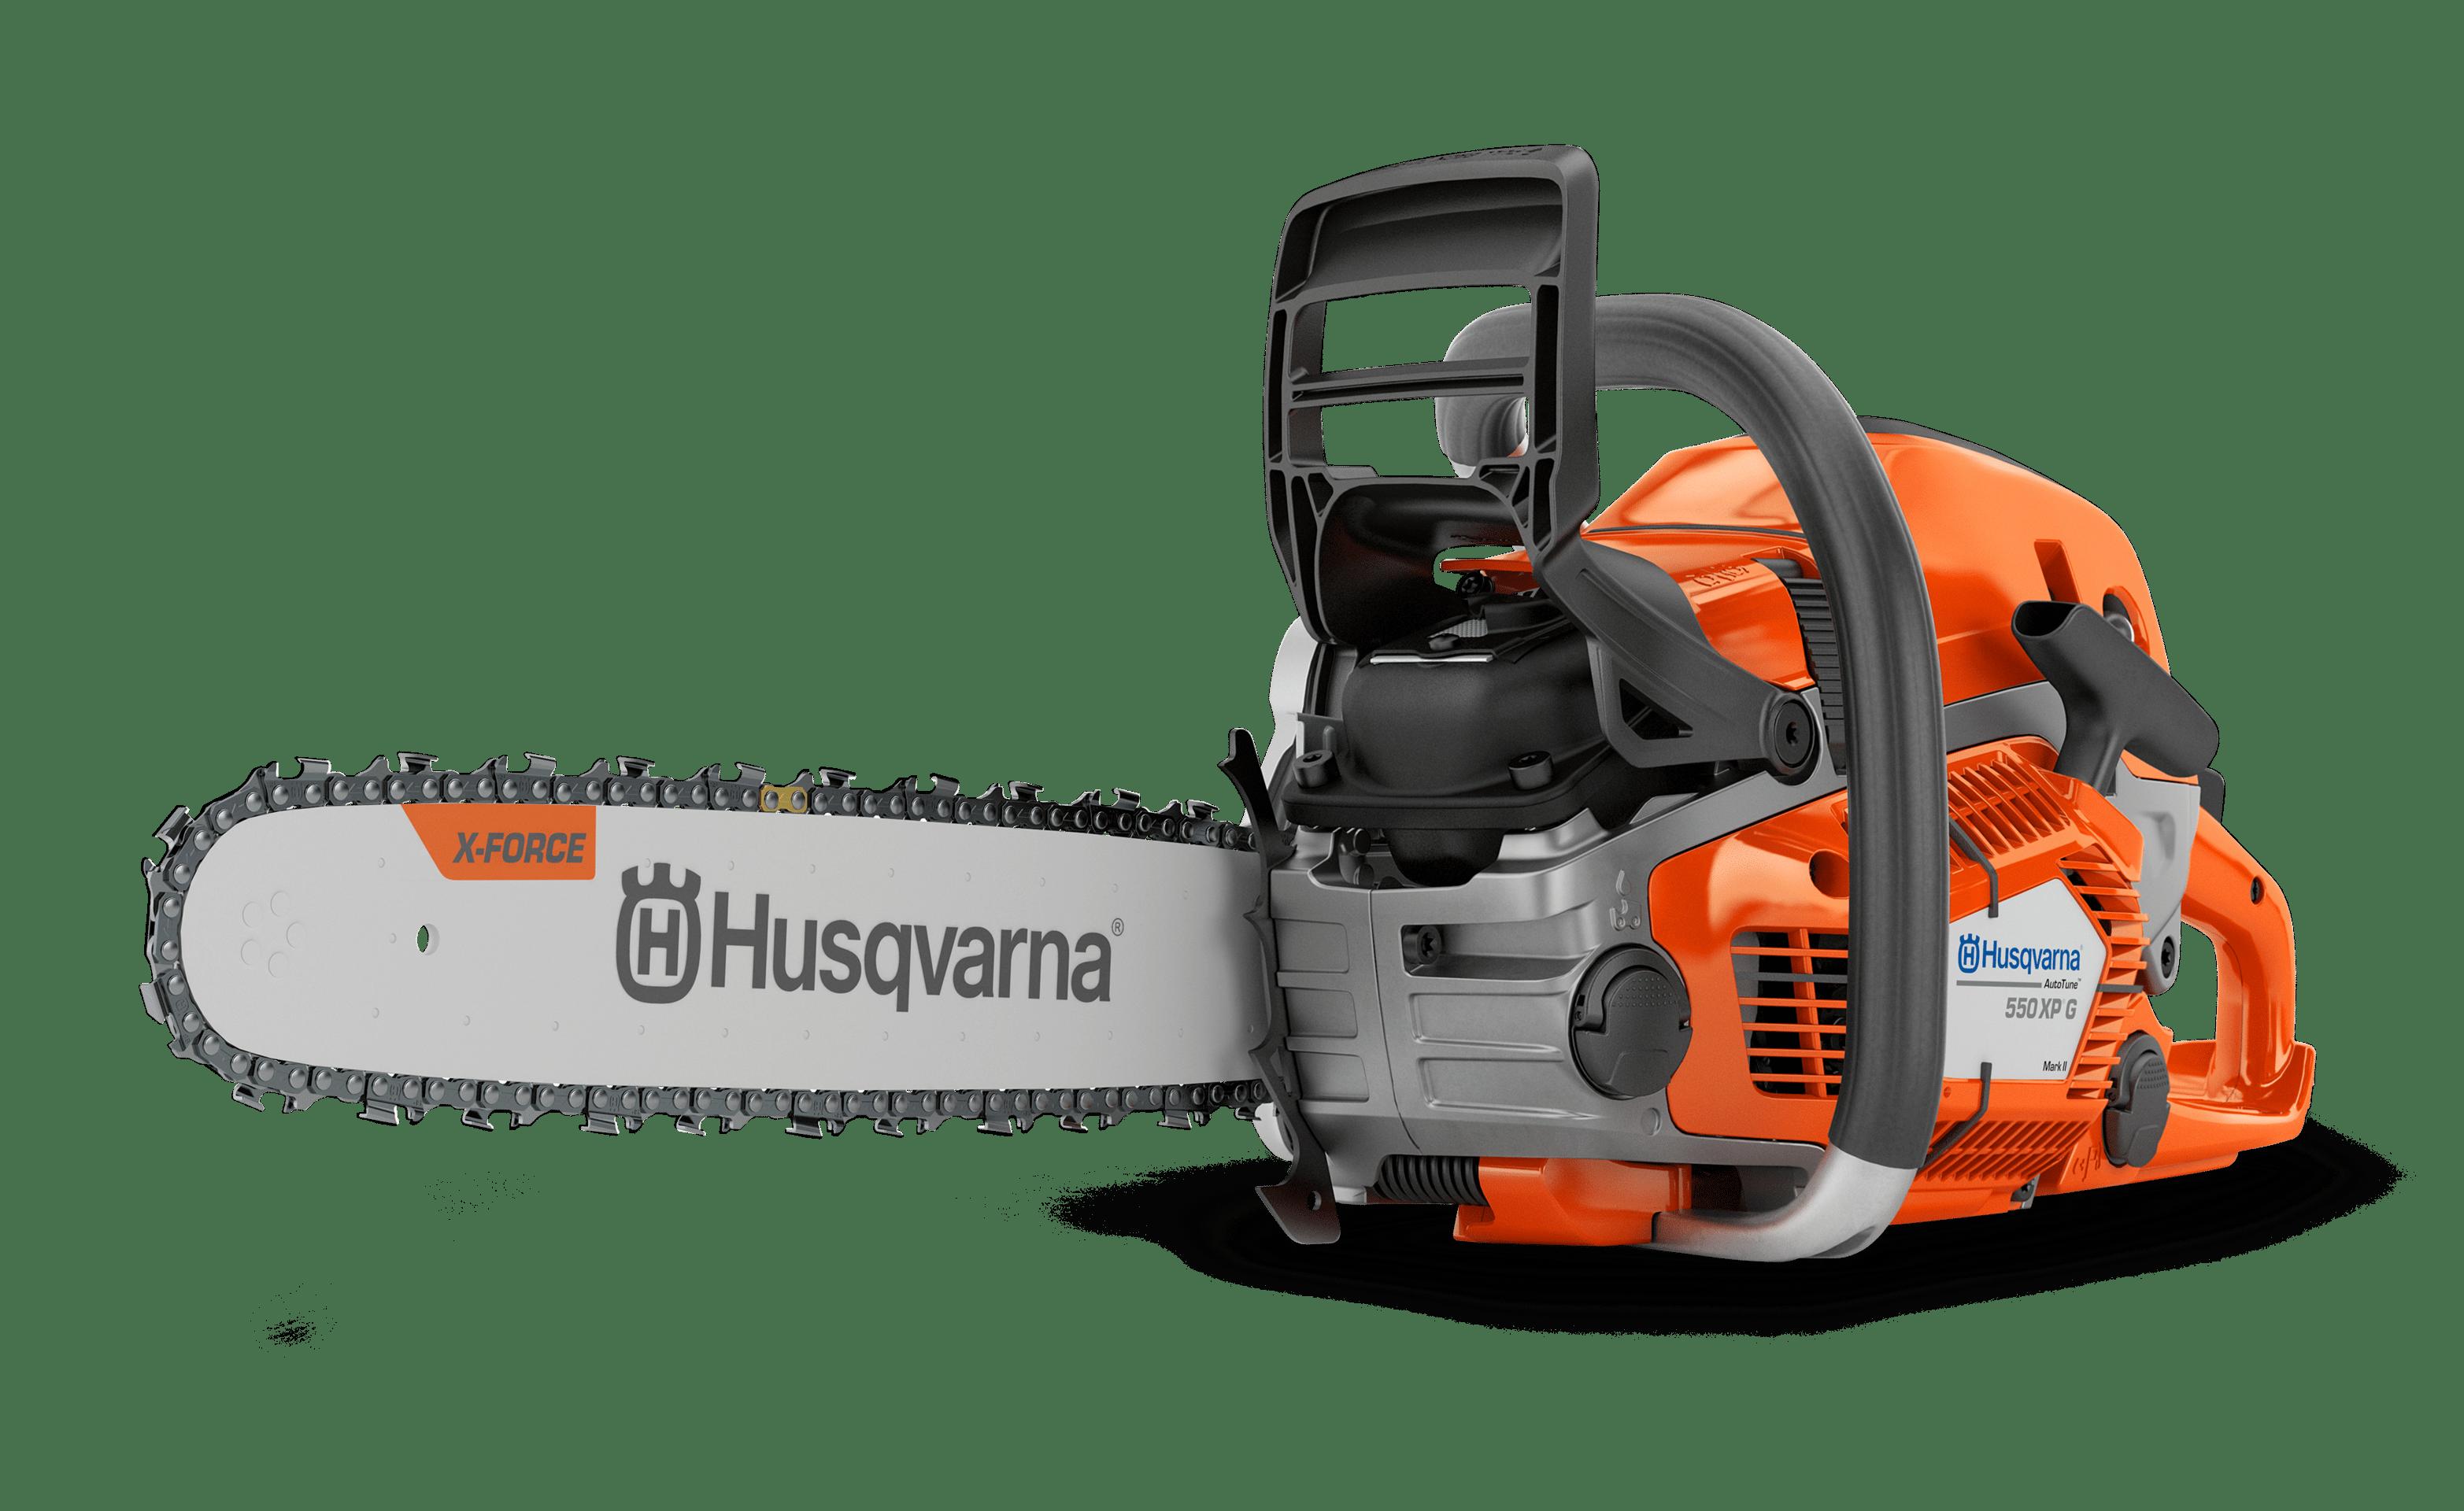 HUSQVARNA 550 XP¨ G Mark II - V-Pro Power Equipment